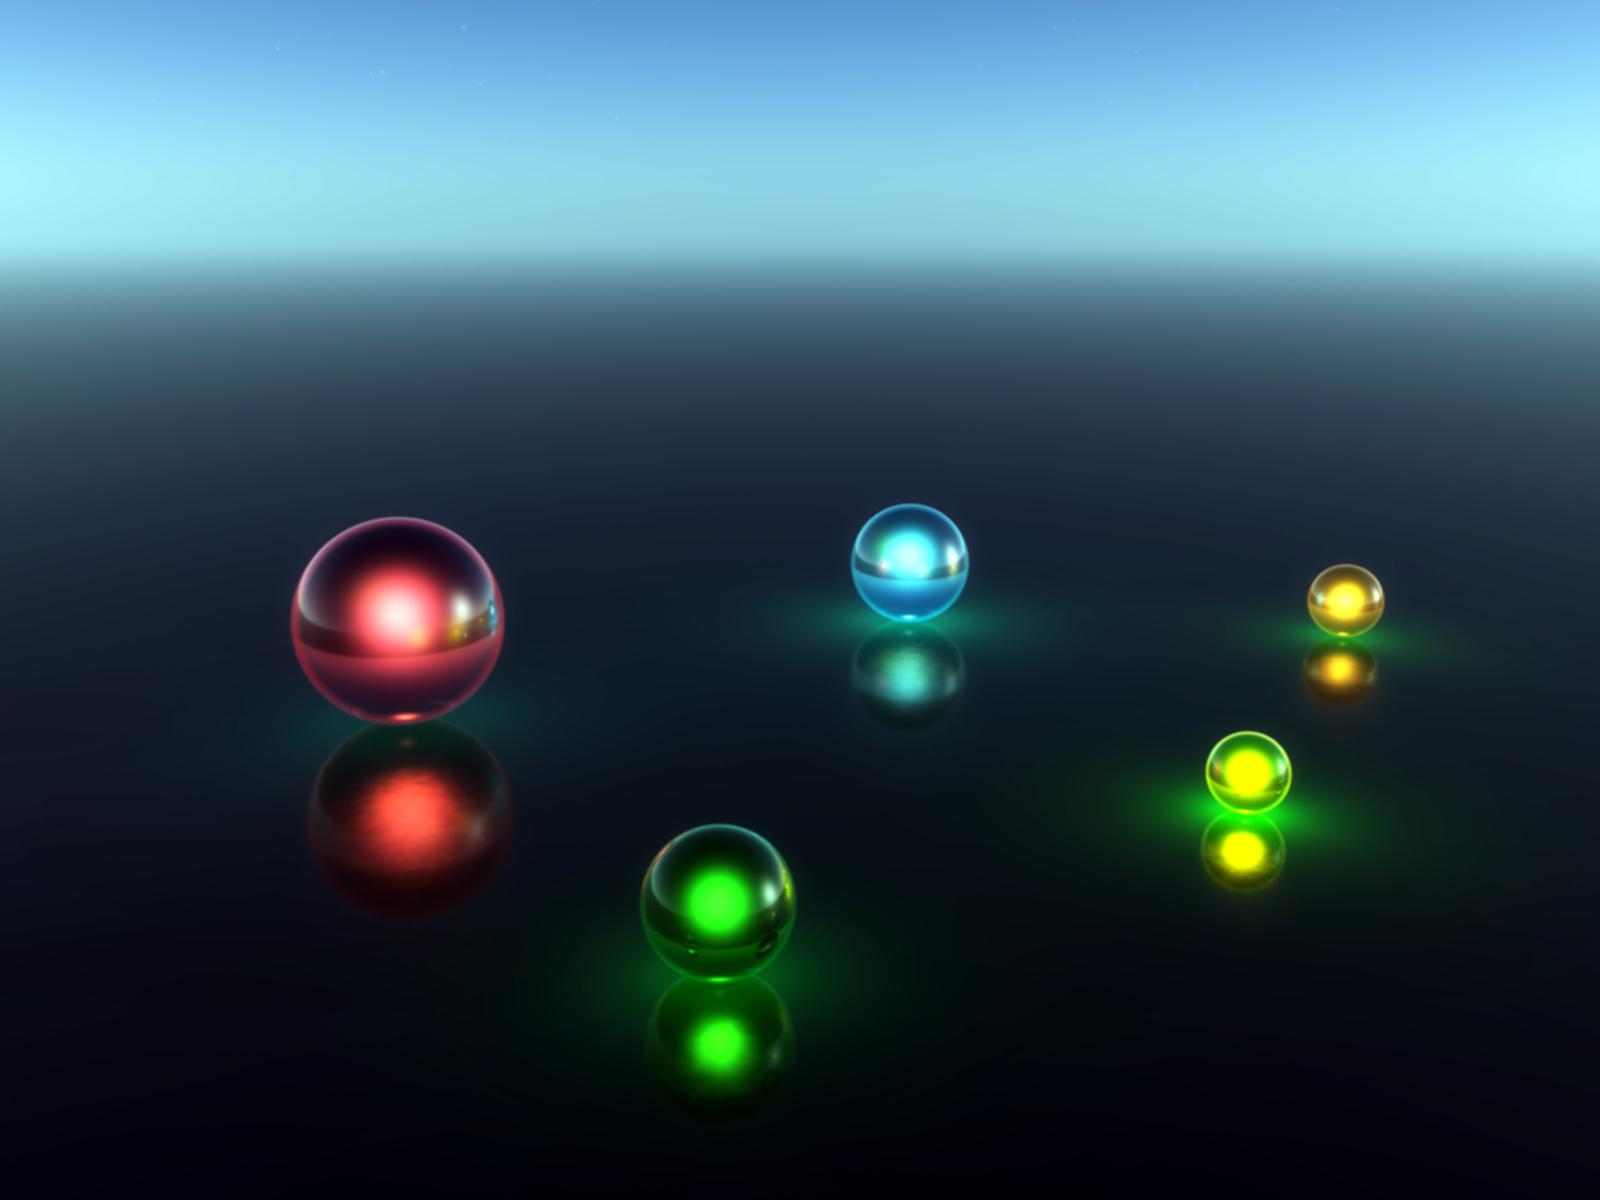 http://2.bp.blogspot.com/-_K_StPIq8b8/UH8QP4hekqI/AAAAAAAACEo/Kbvau89t6gc/s1600/Bonitas+esferas+peque%C3%B1itas+de+colores+brillantes.jpg